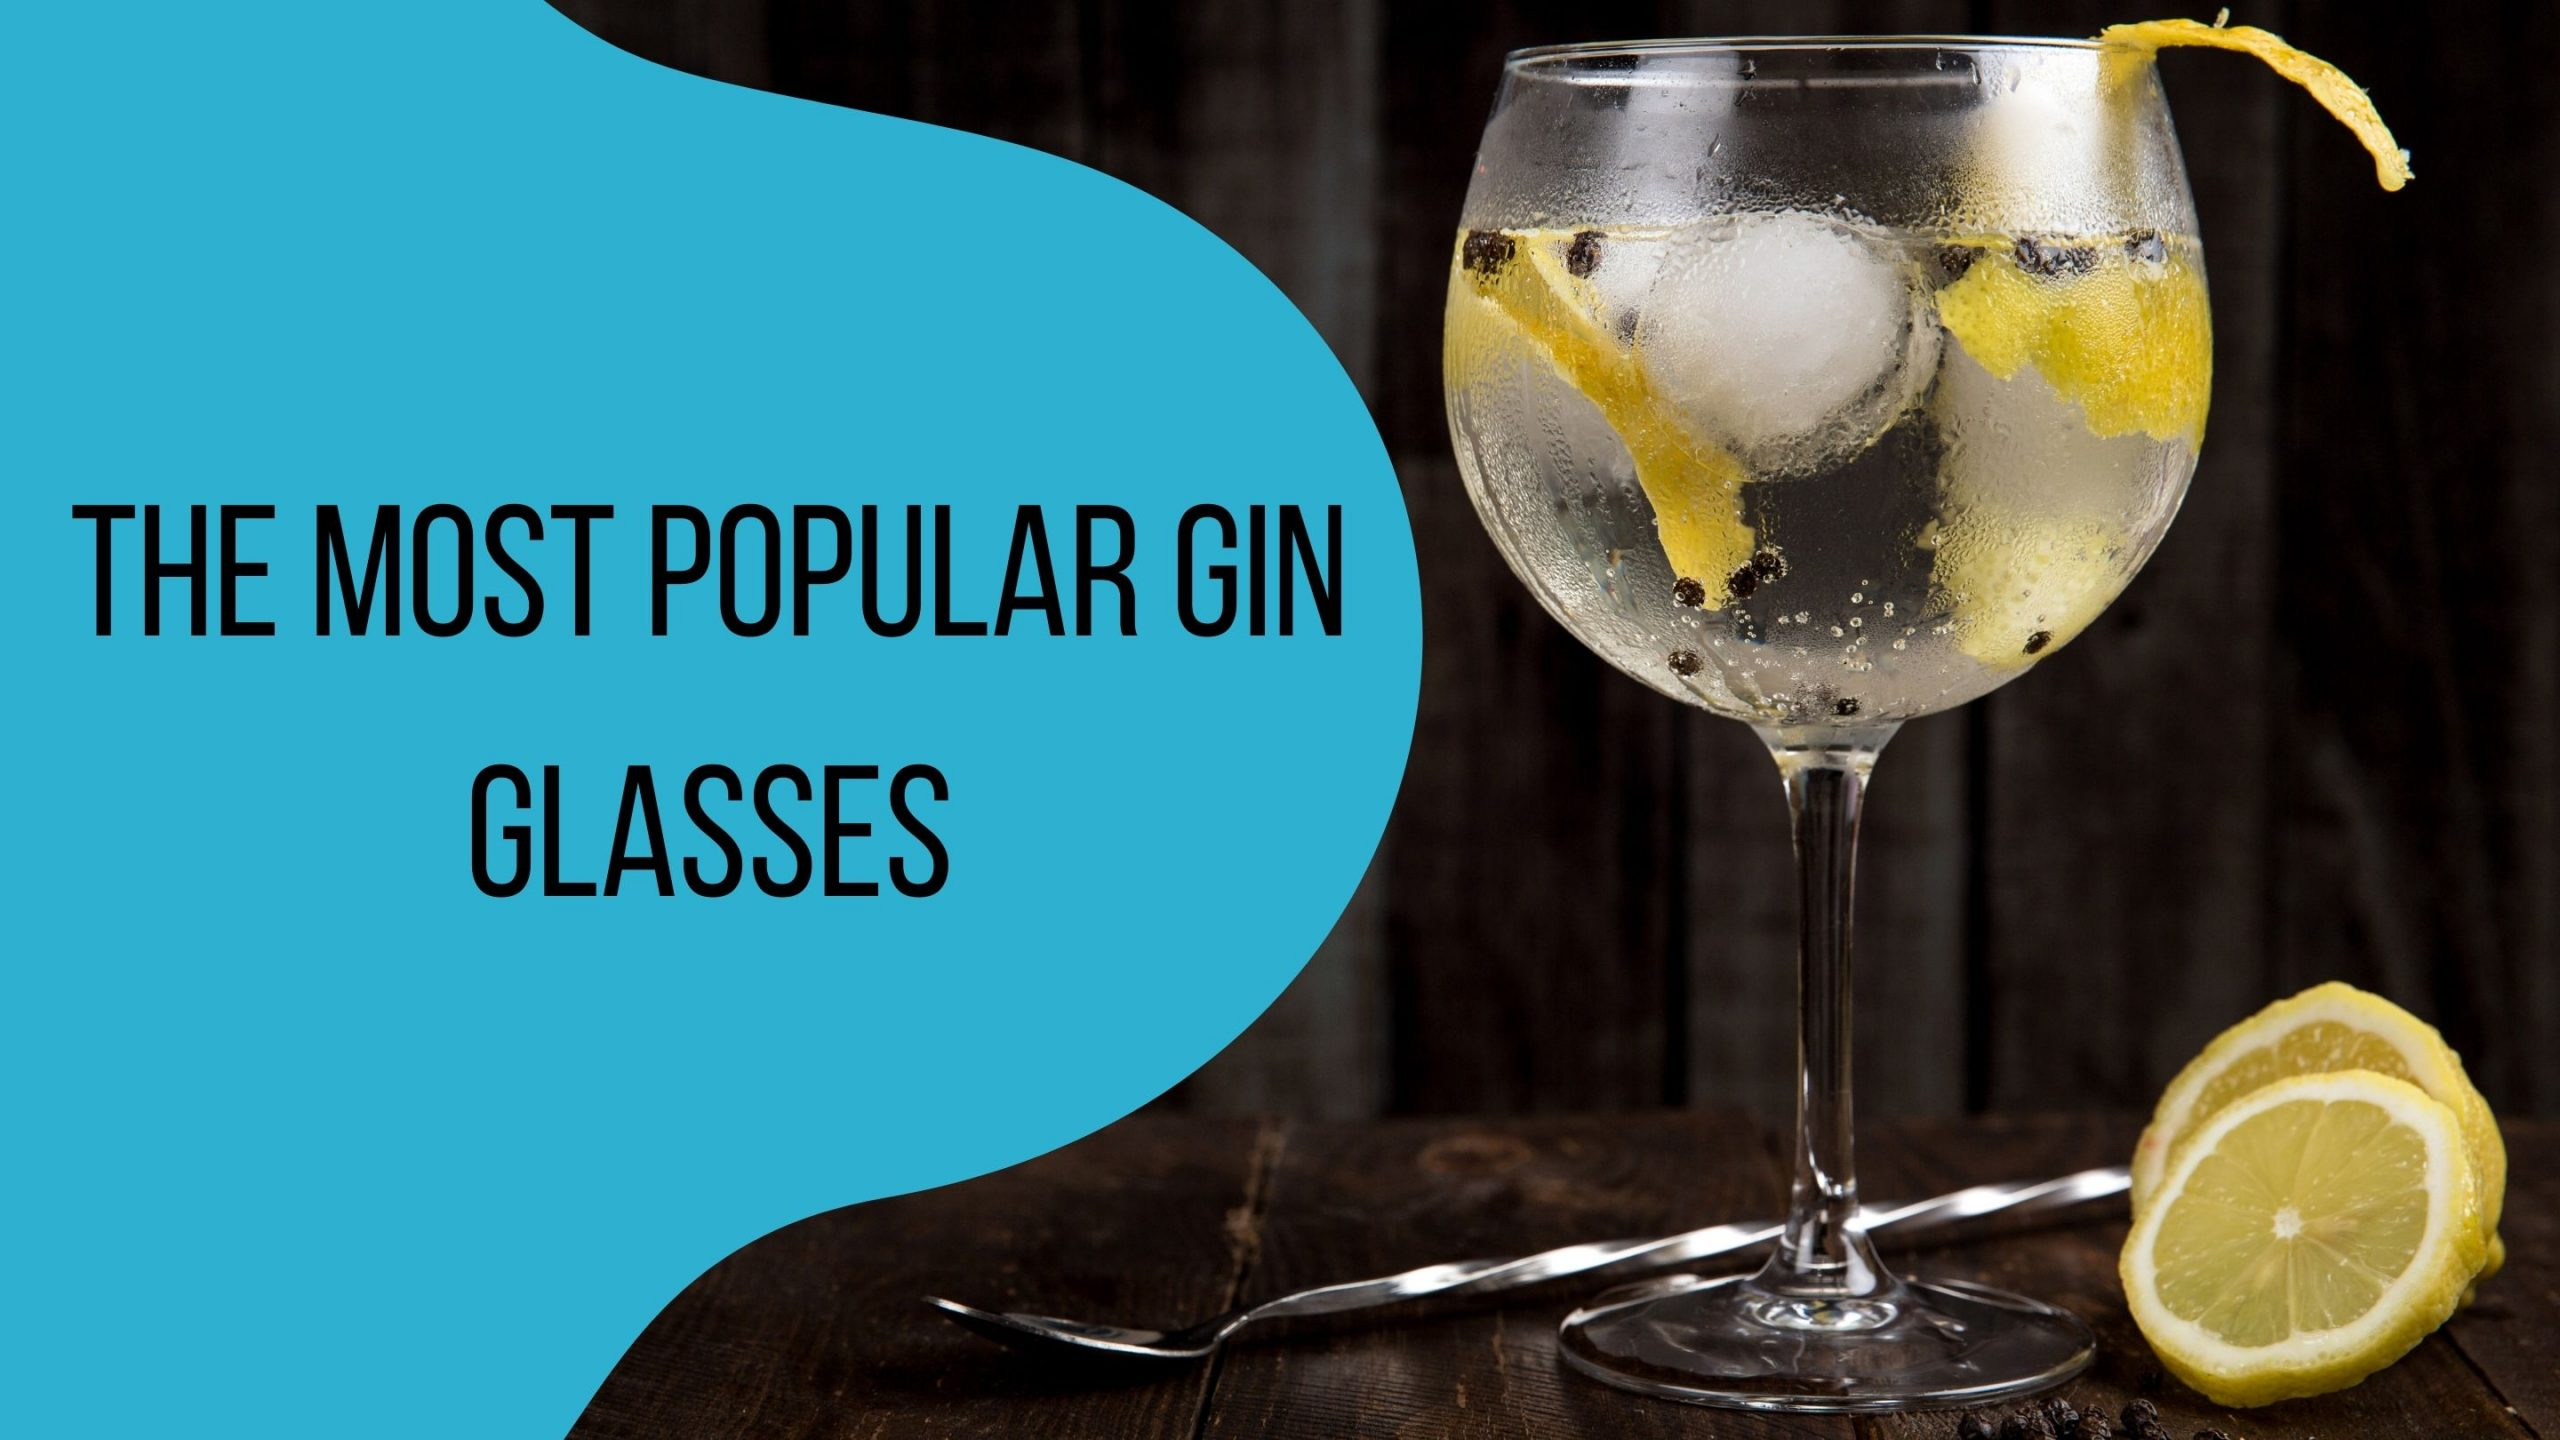 Most popular gin glasses header image